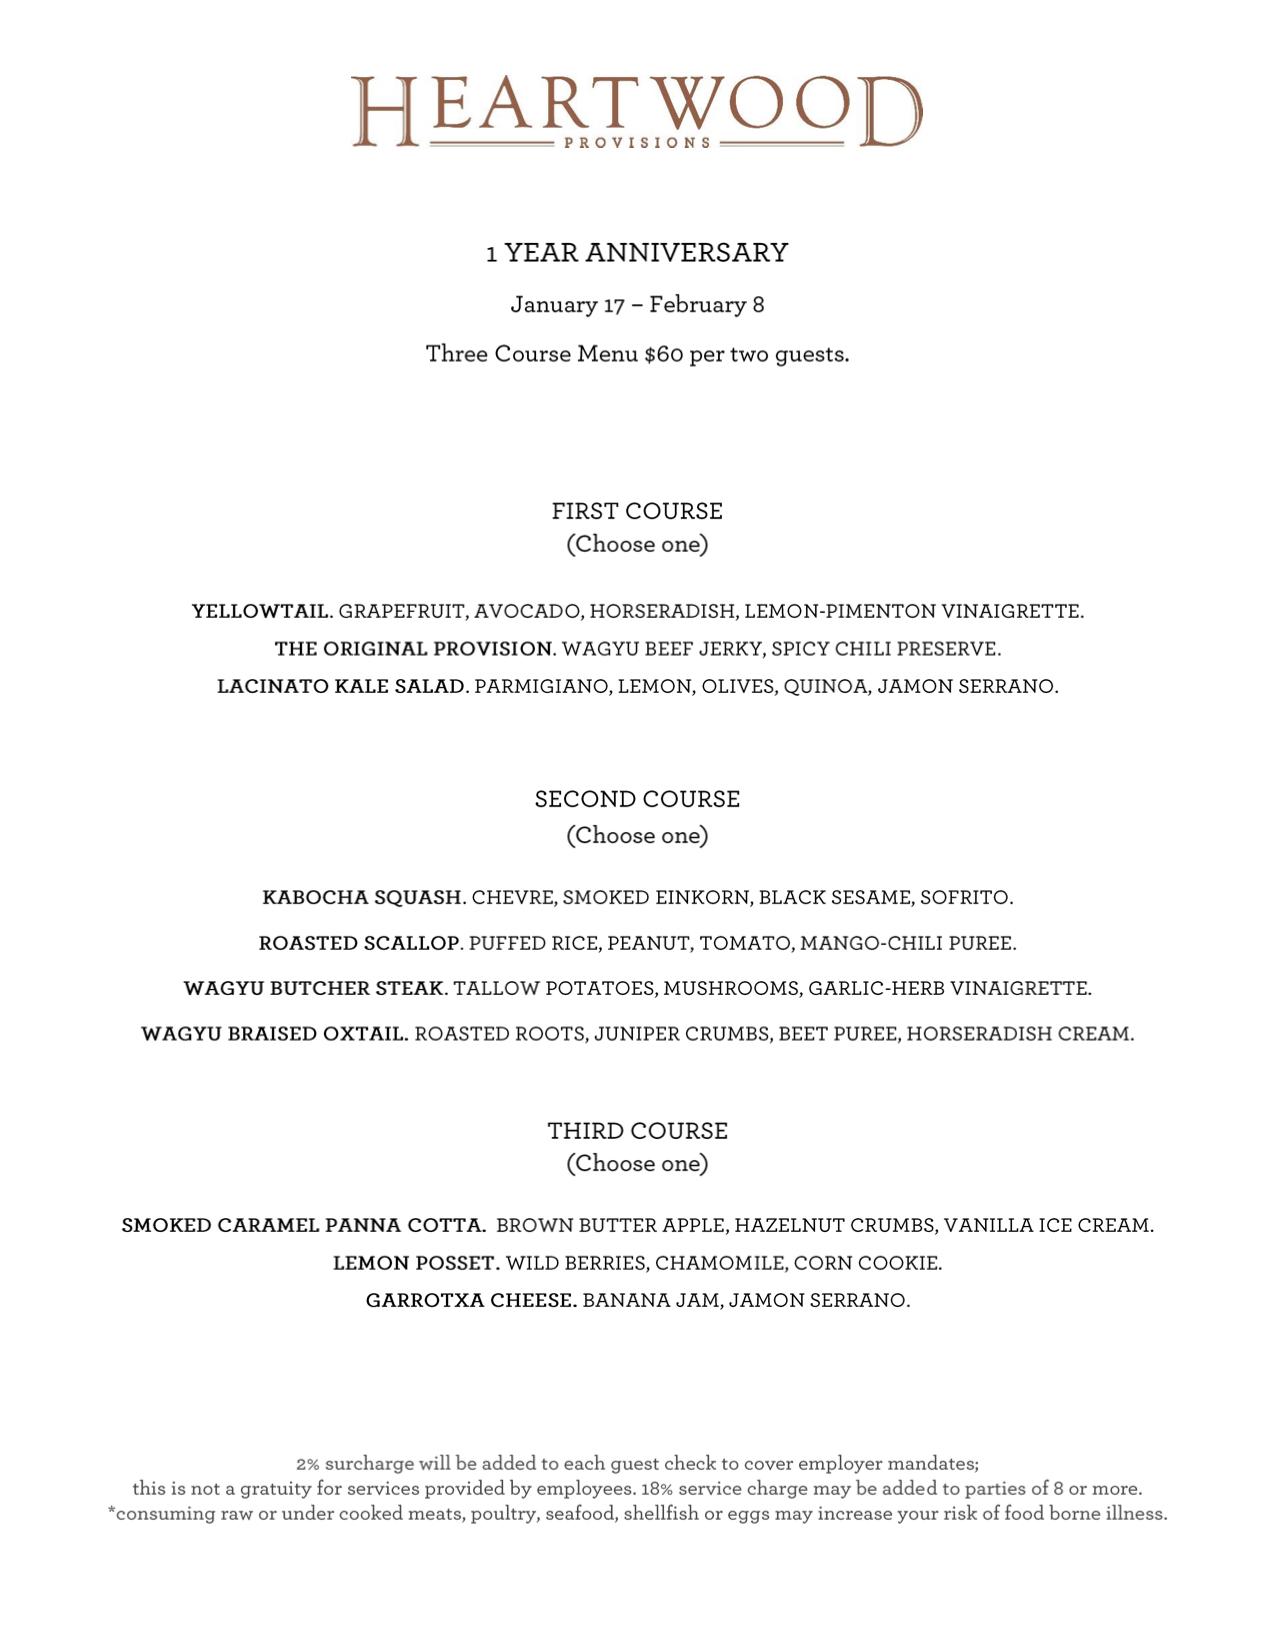 heartwood-anniversary-menu